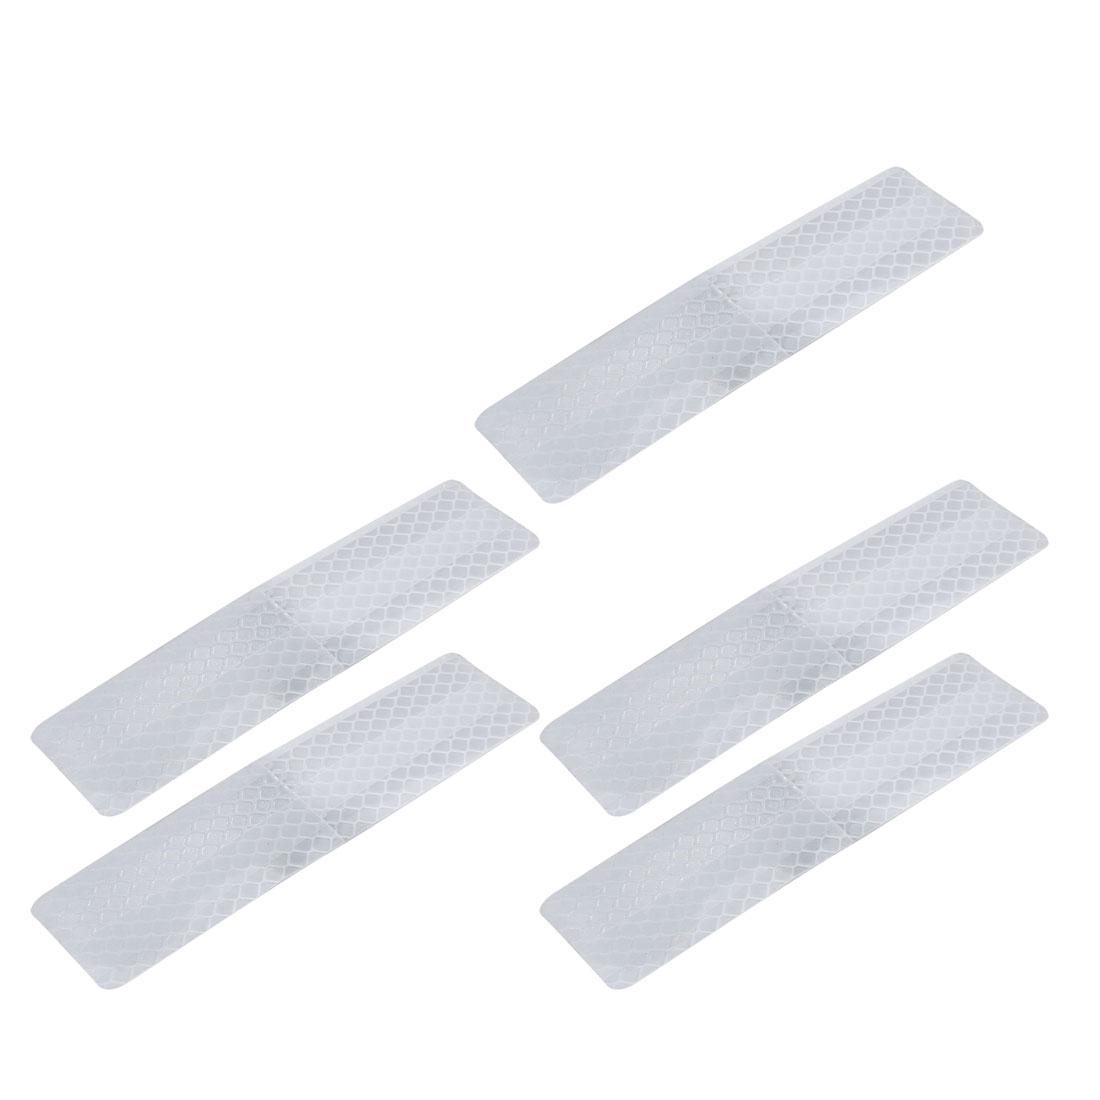 5pcs Honeycomb Reflective Warning Tape Film Sticker White 30mm x 120mm